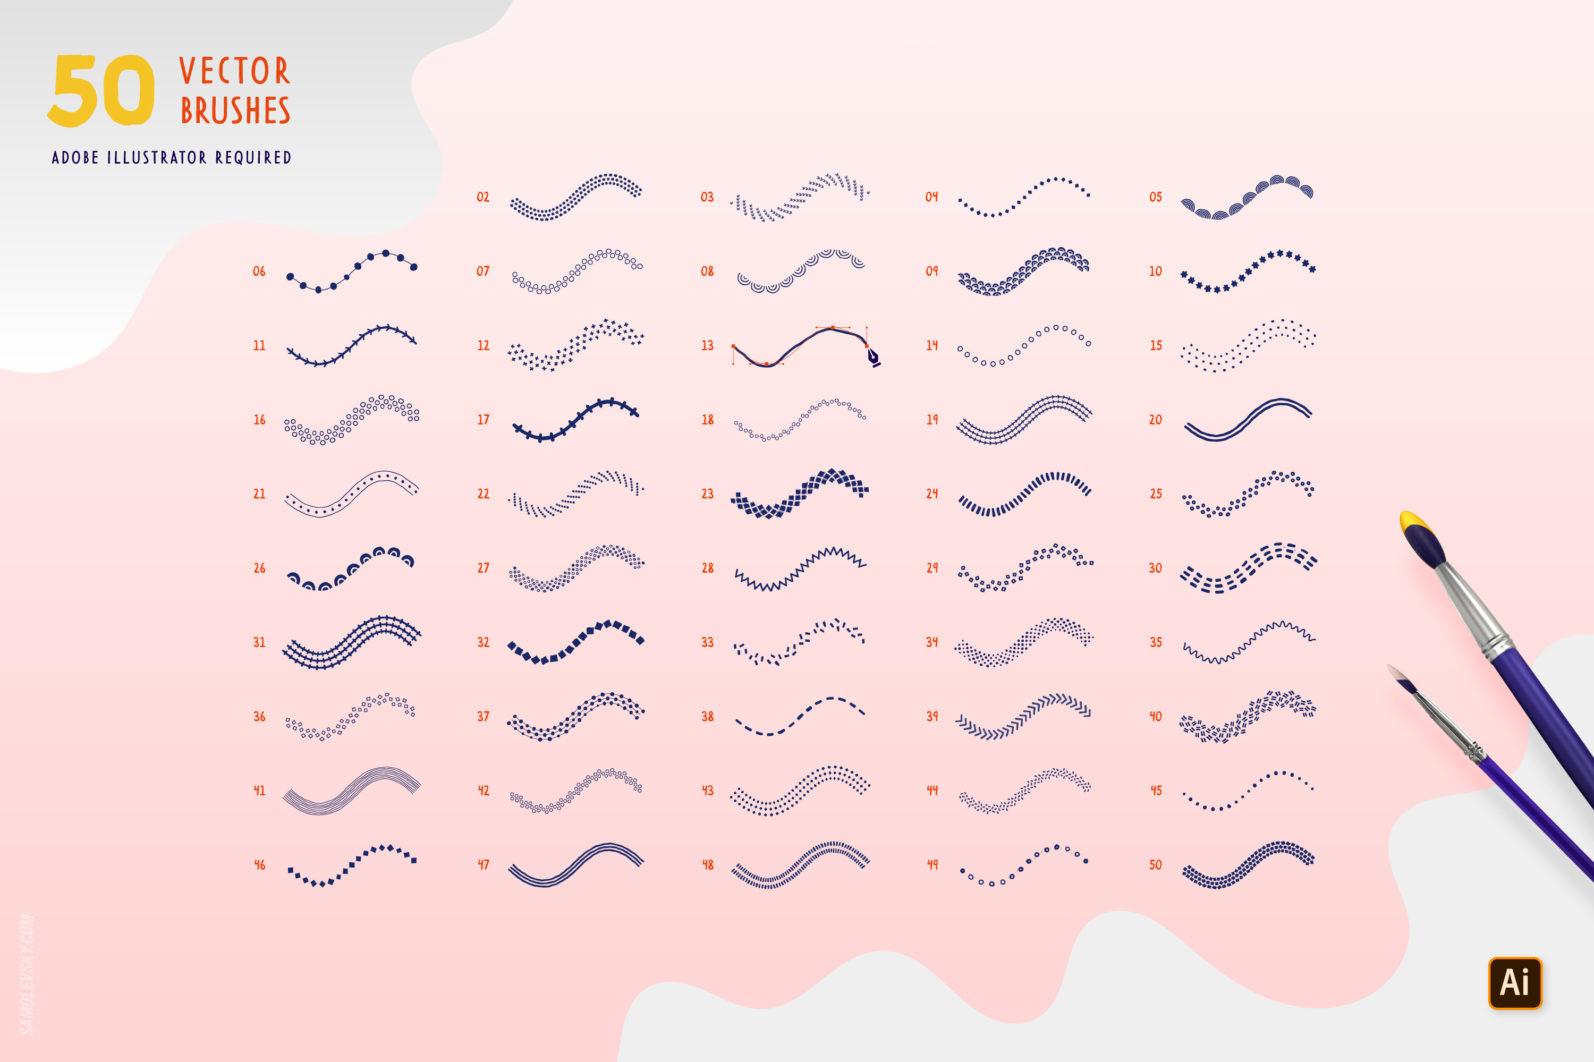 Handmade patterns bundle - 300 seamless patterns, brushes, and shapes - Samolevsky.com Handmade patterns bundle 13 scaled -